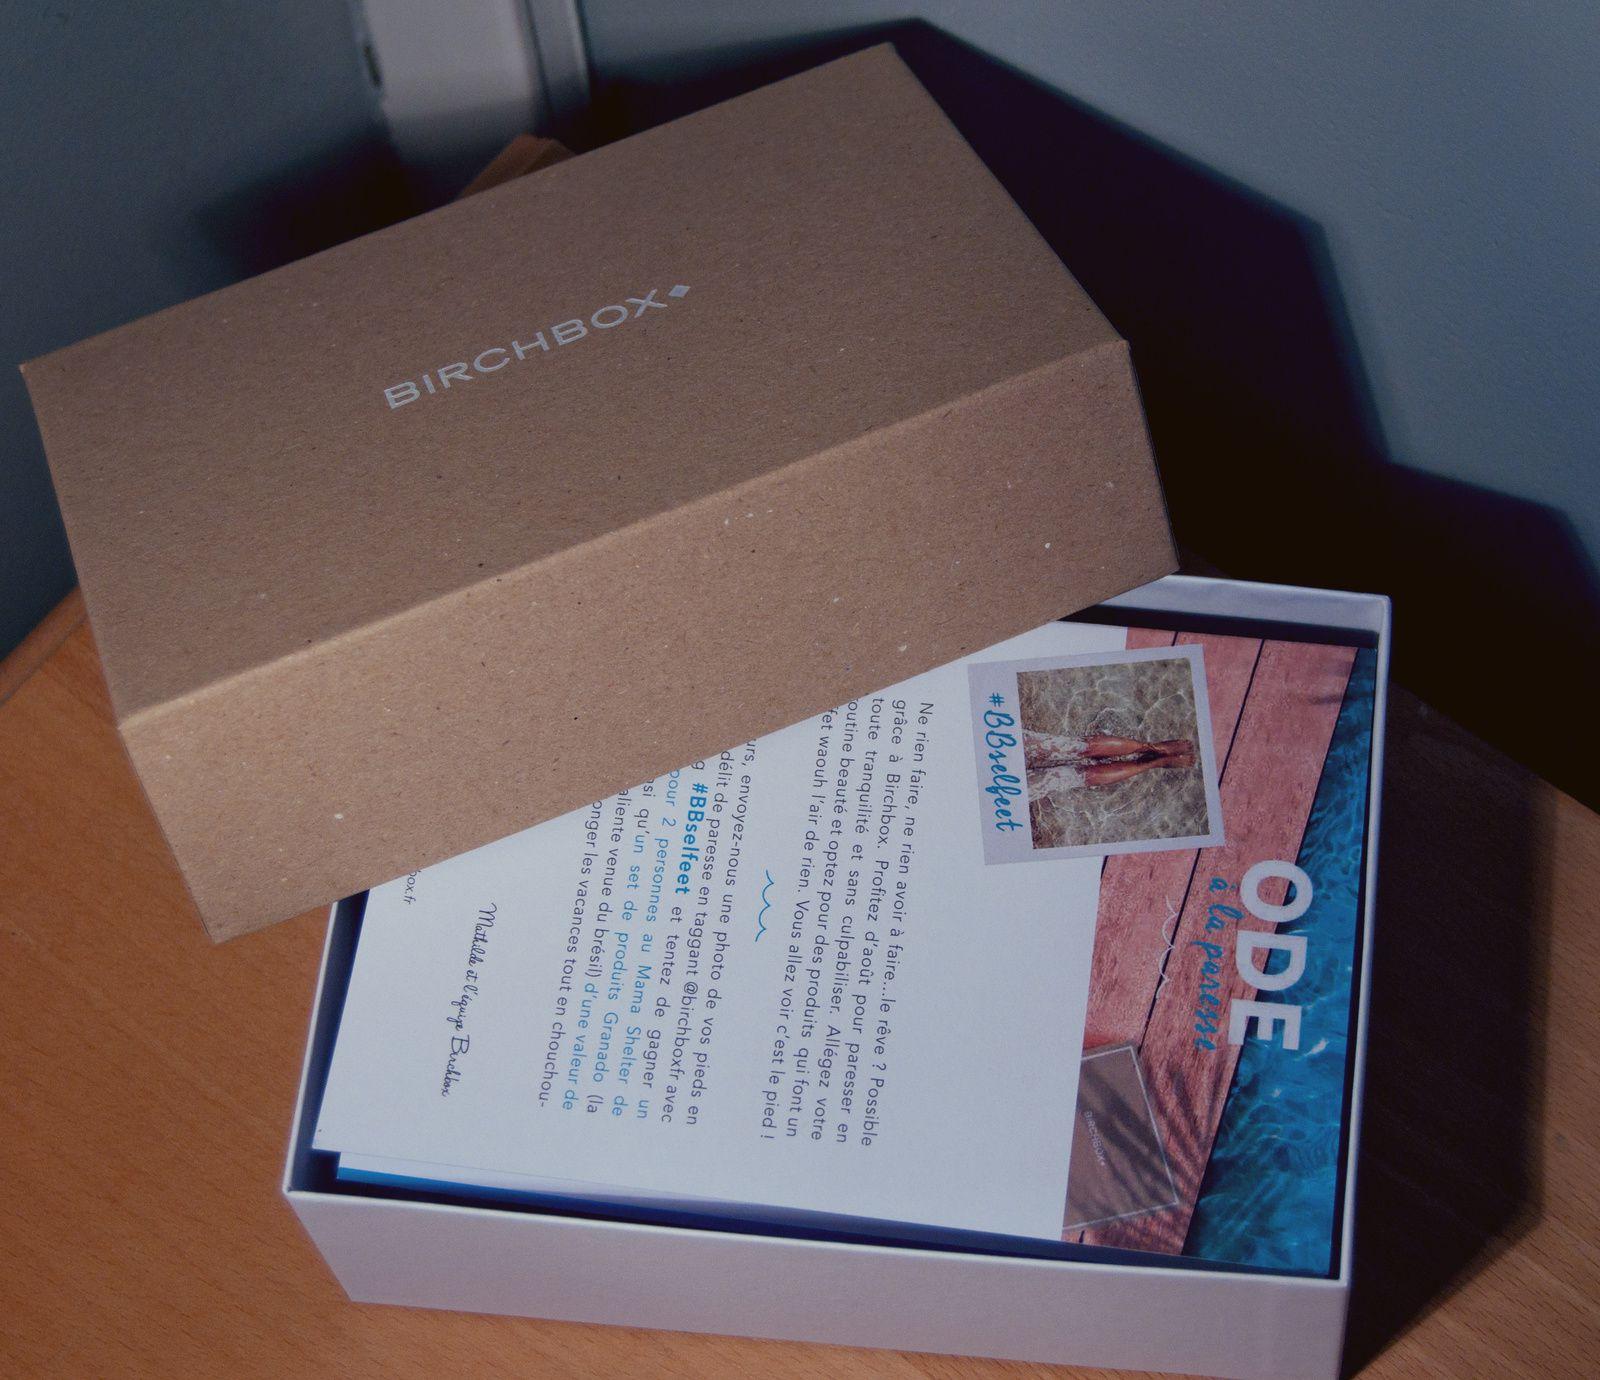 Birchbox Ôde à la Paresse - Août 2014